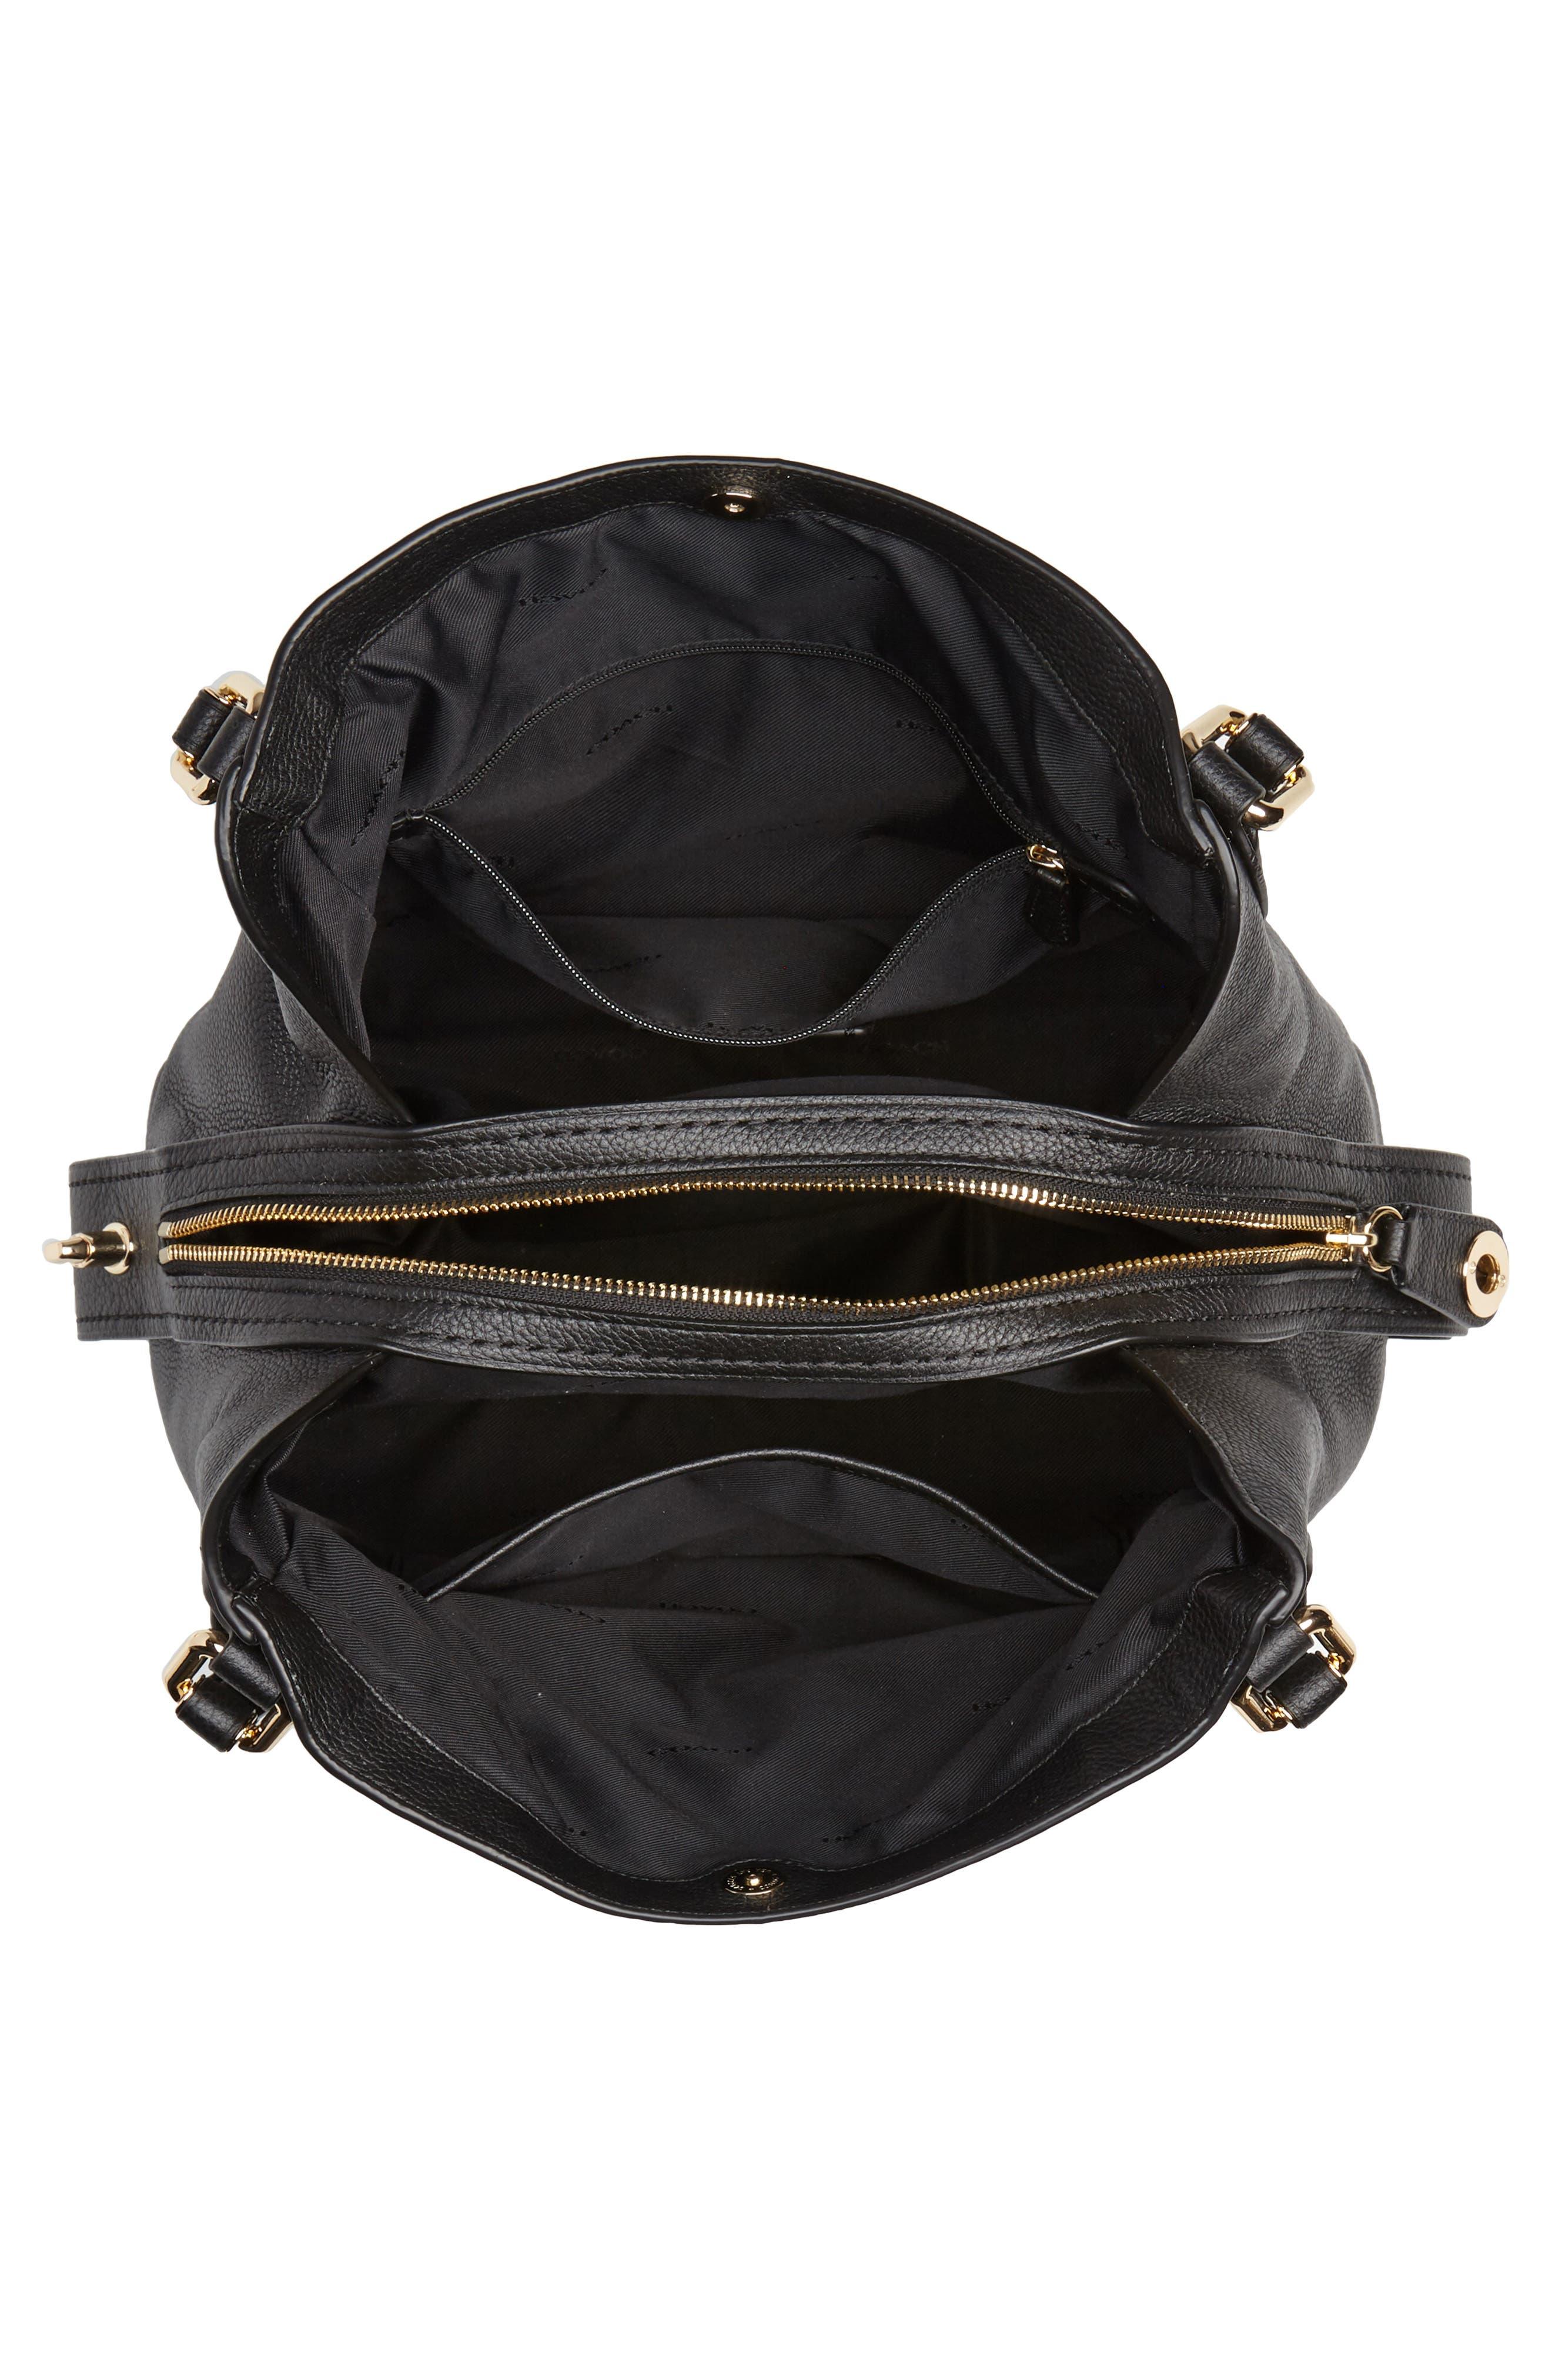 Edie 31 Pebbled Leather Shoulder Bag,                             Alternate thumbnail 4, color,                             Black